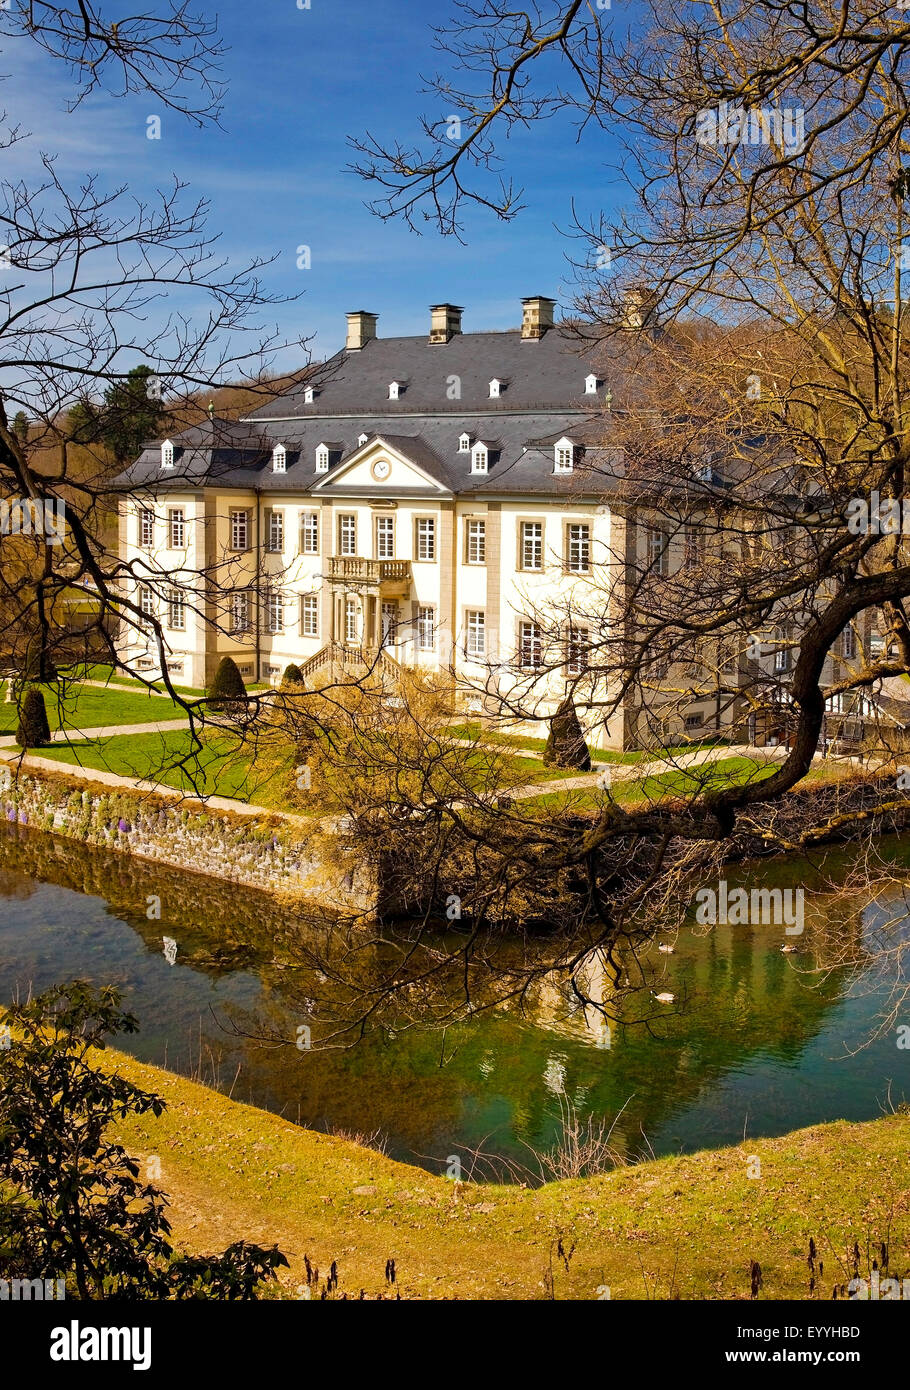 Koertlinghausen Castle in spring, district Kallenhardt, Germany, North Rhine-Westphalia, Ruethen - Stock Image